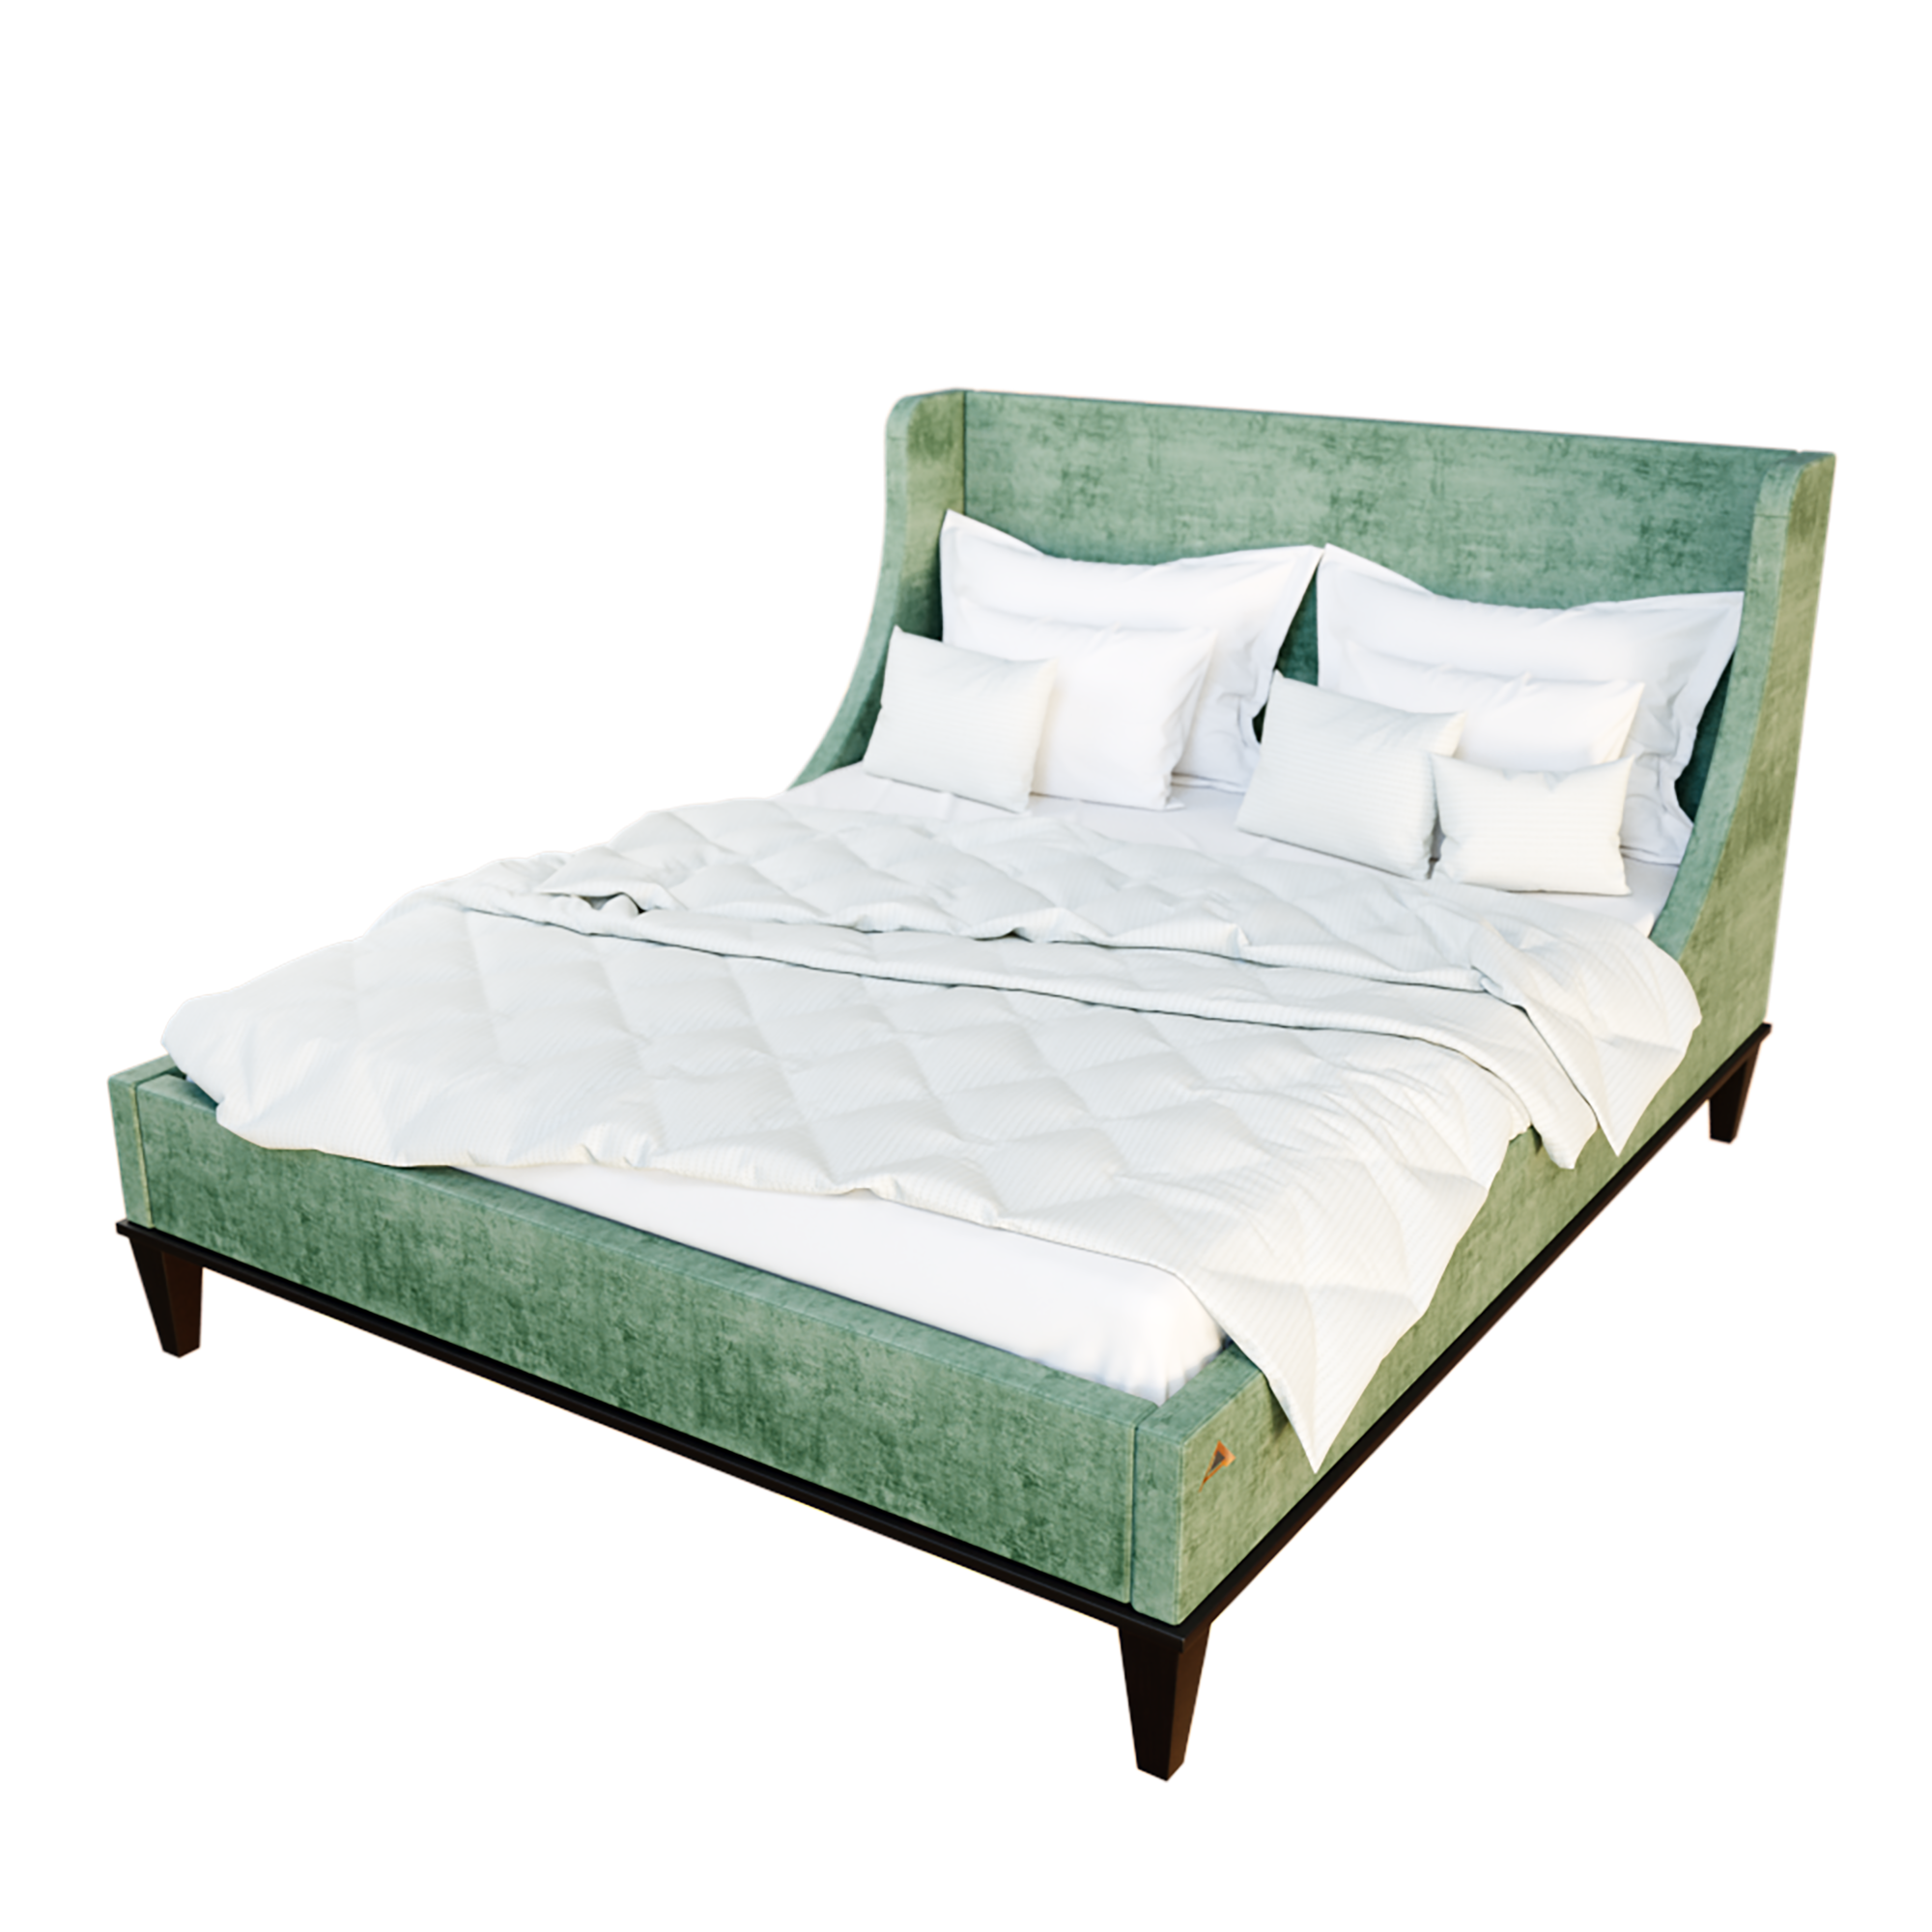 Кровать K003 Any-Home - K003 | AnyHome.ru